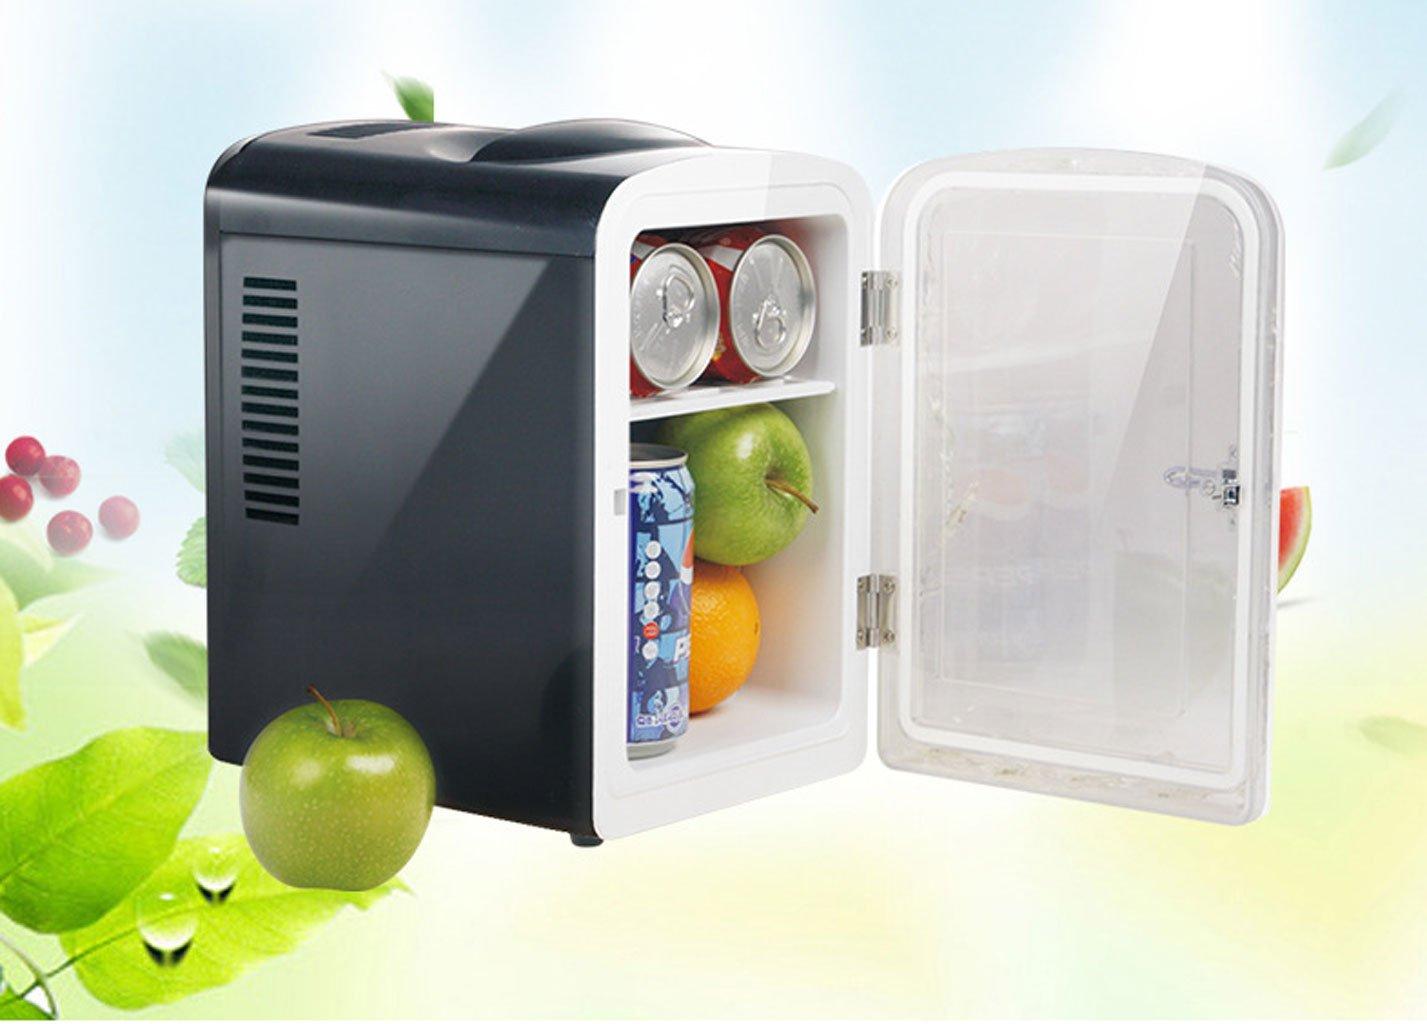 Bosch Kühlschrank Heiß : Siemens kühlschrank heiß siemens kühl gefrierkombi kg vvl kühlt